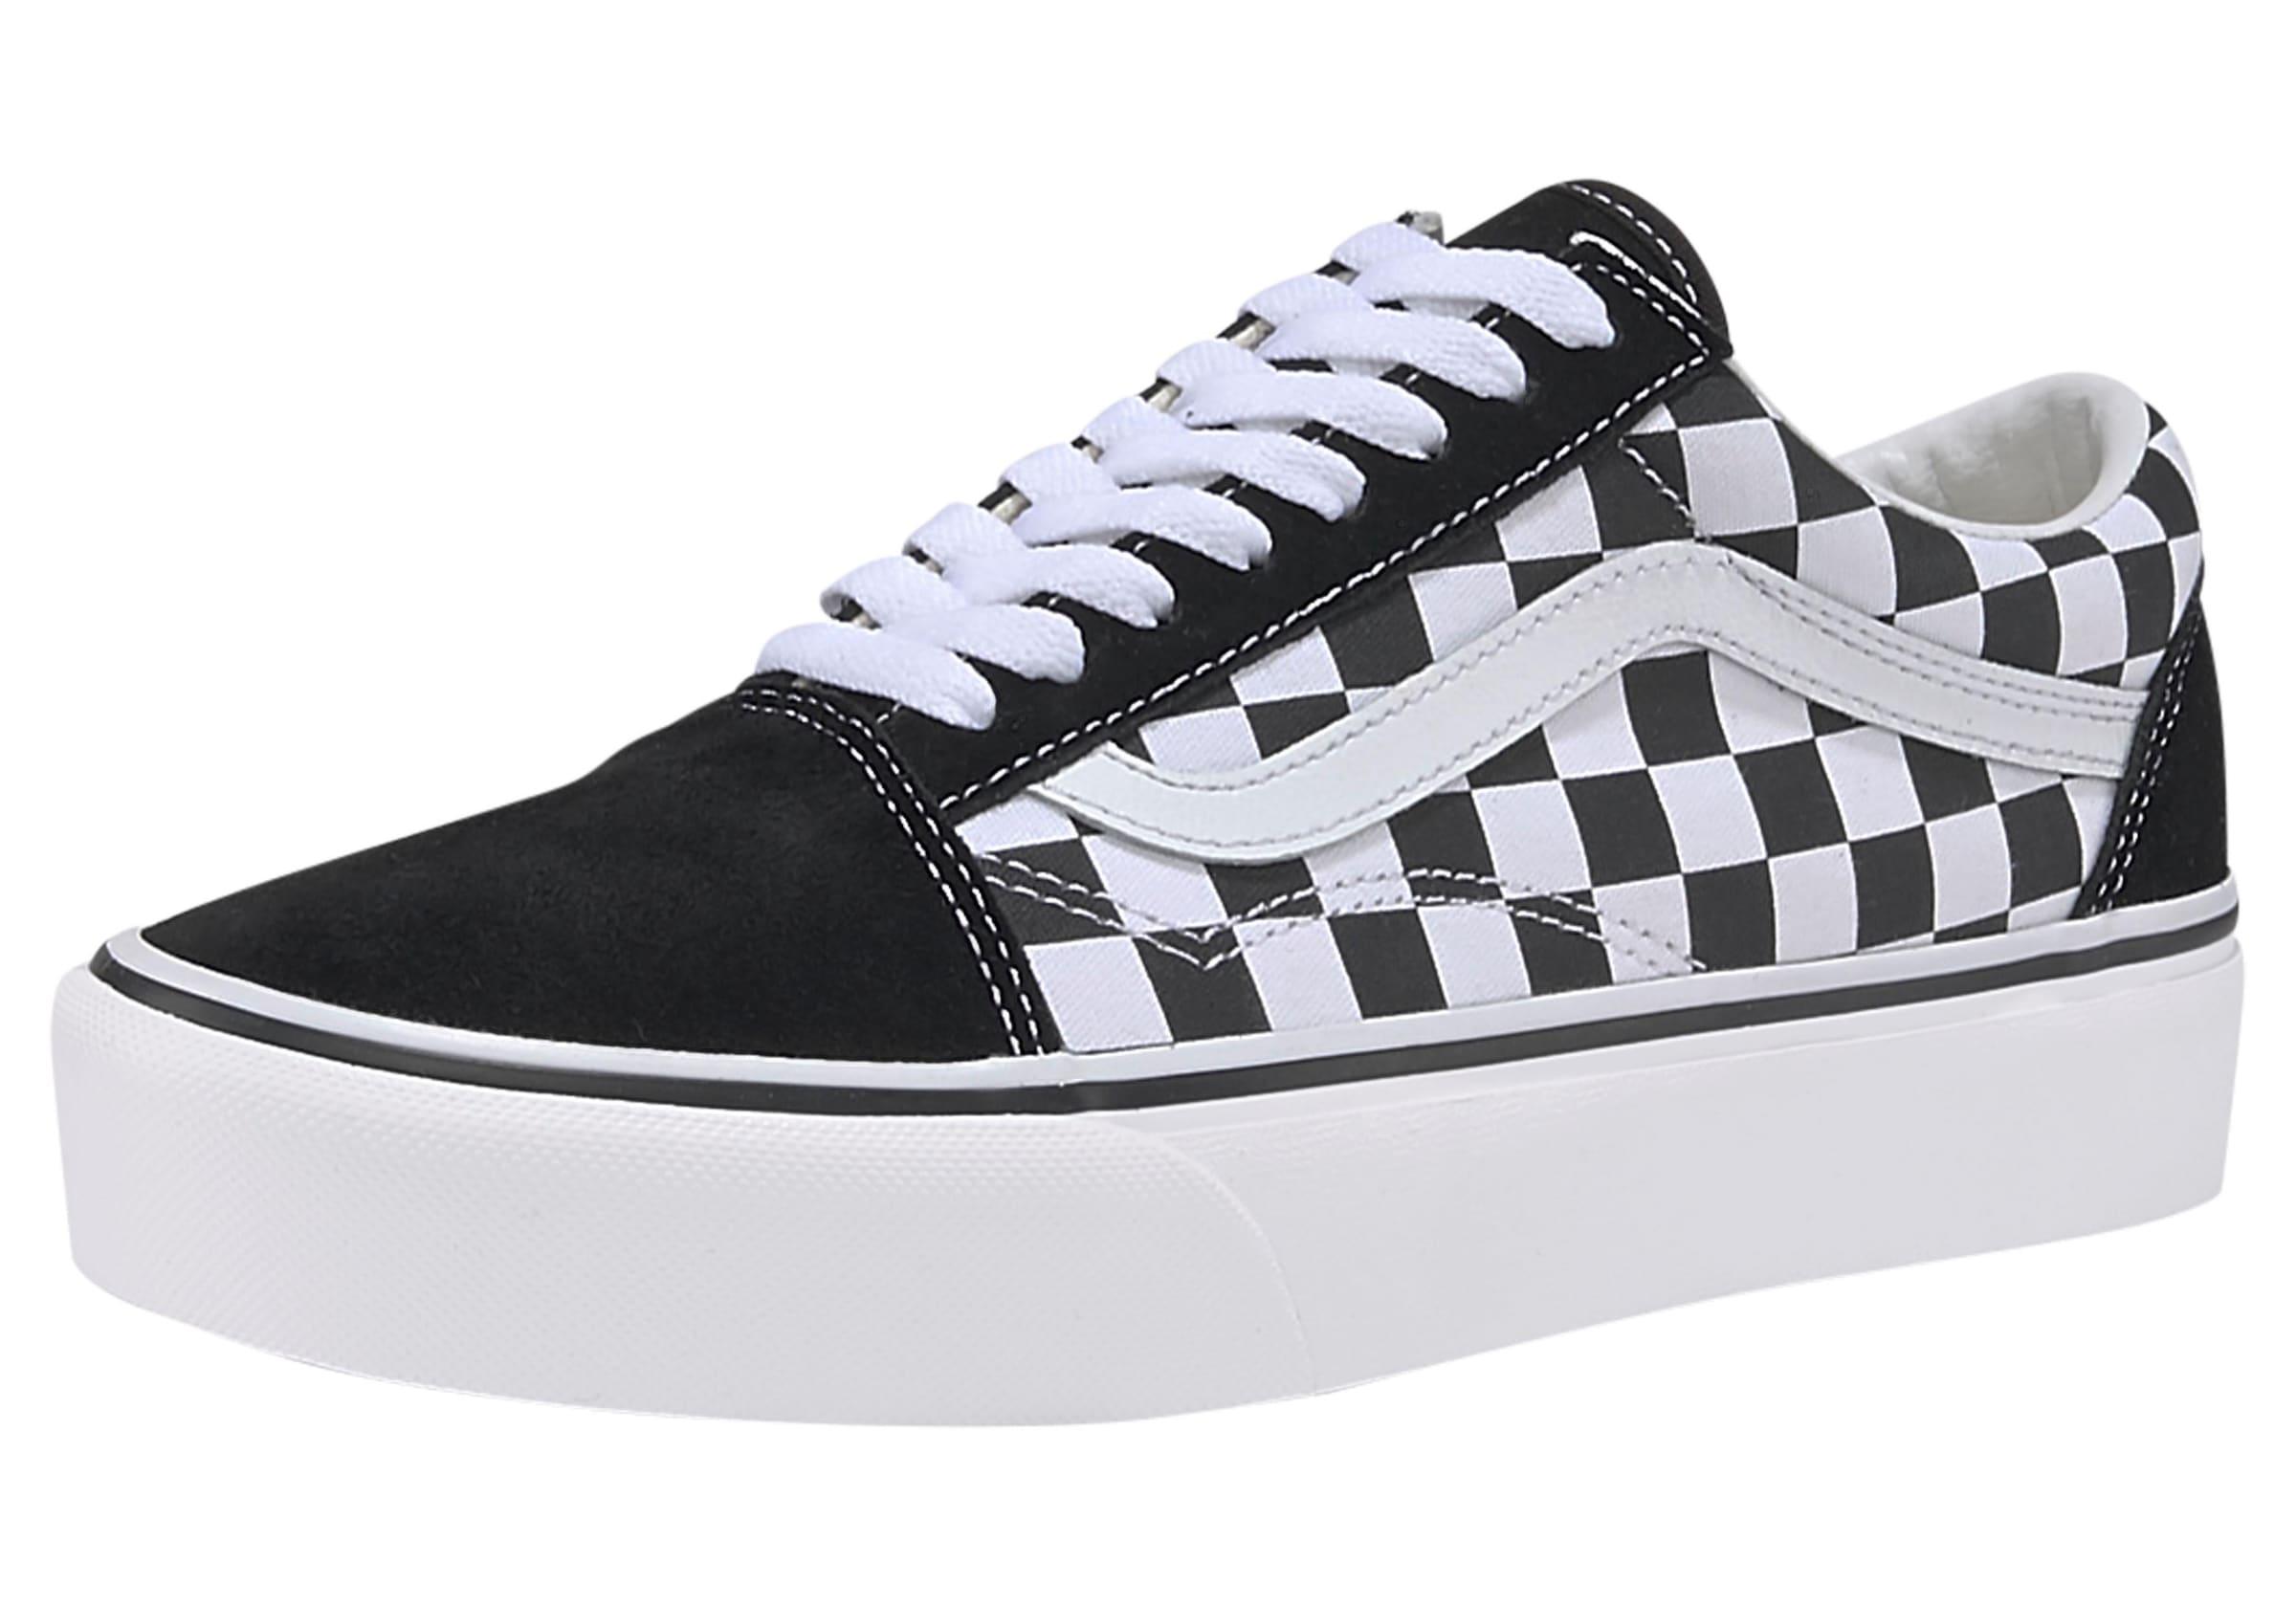 Vans Checkerboard Old Skool Sneaker | Vans schachbrett